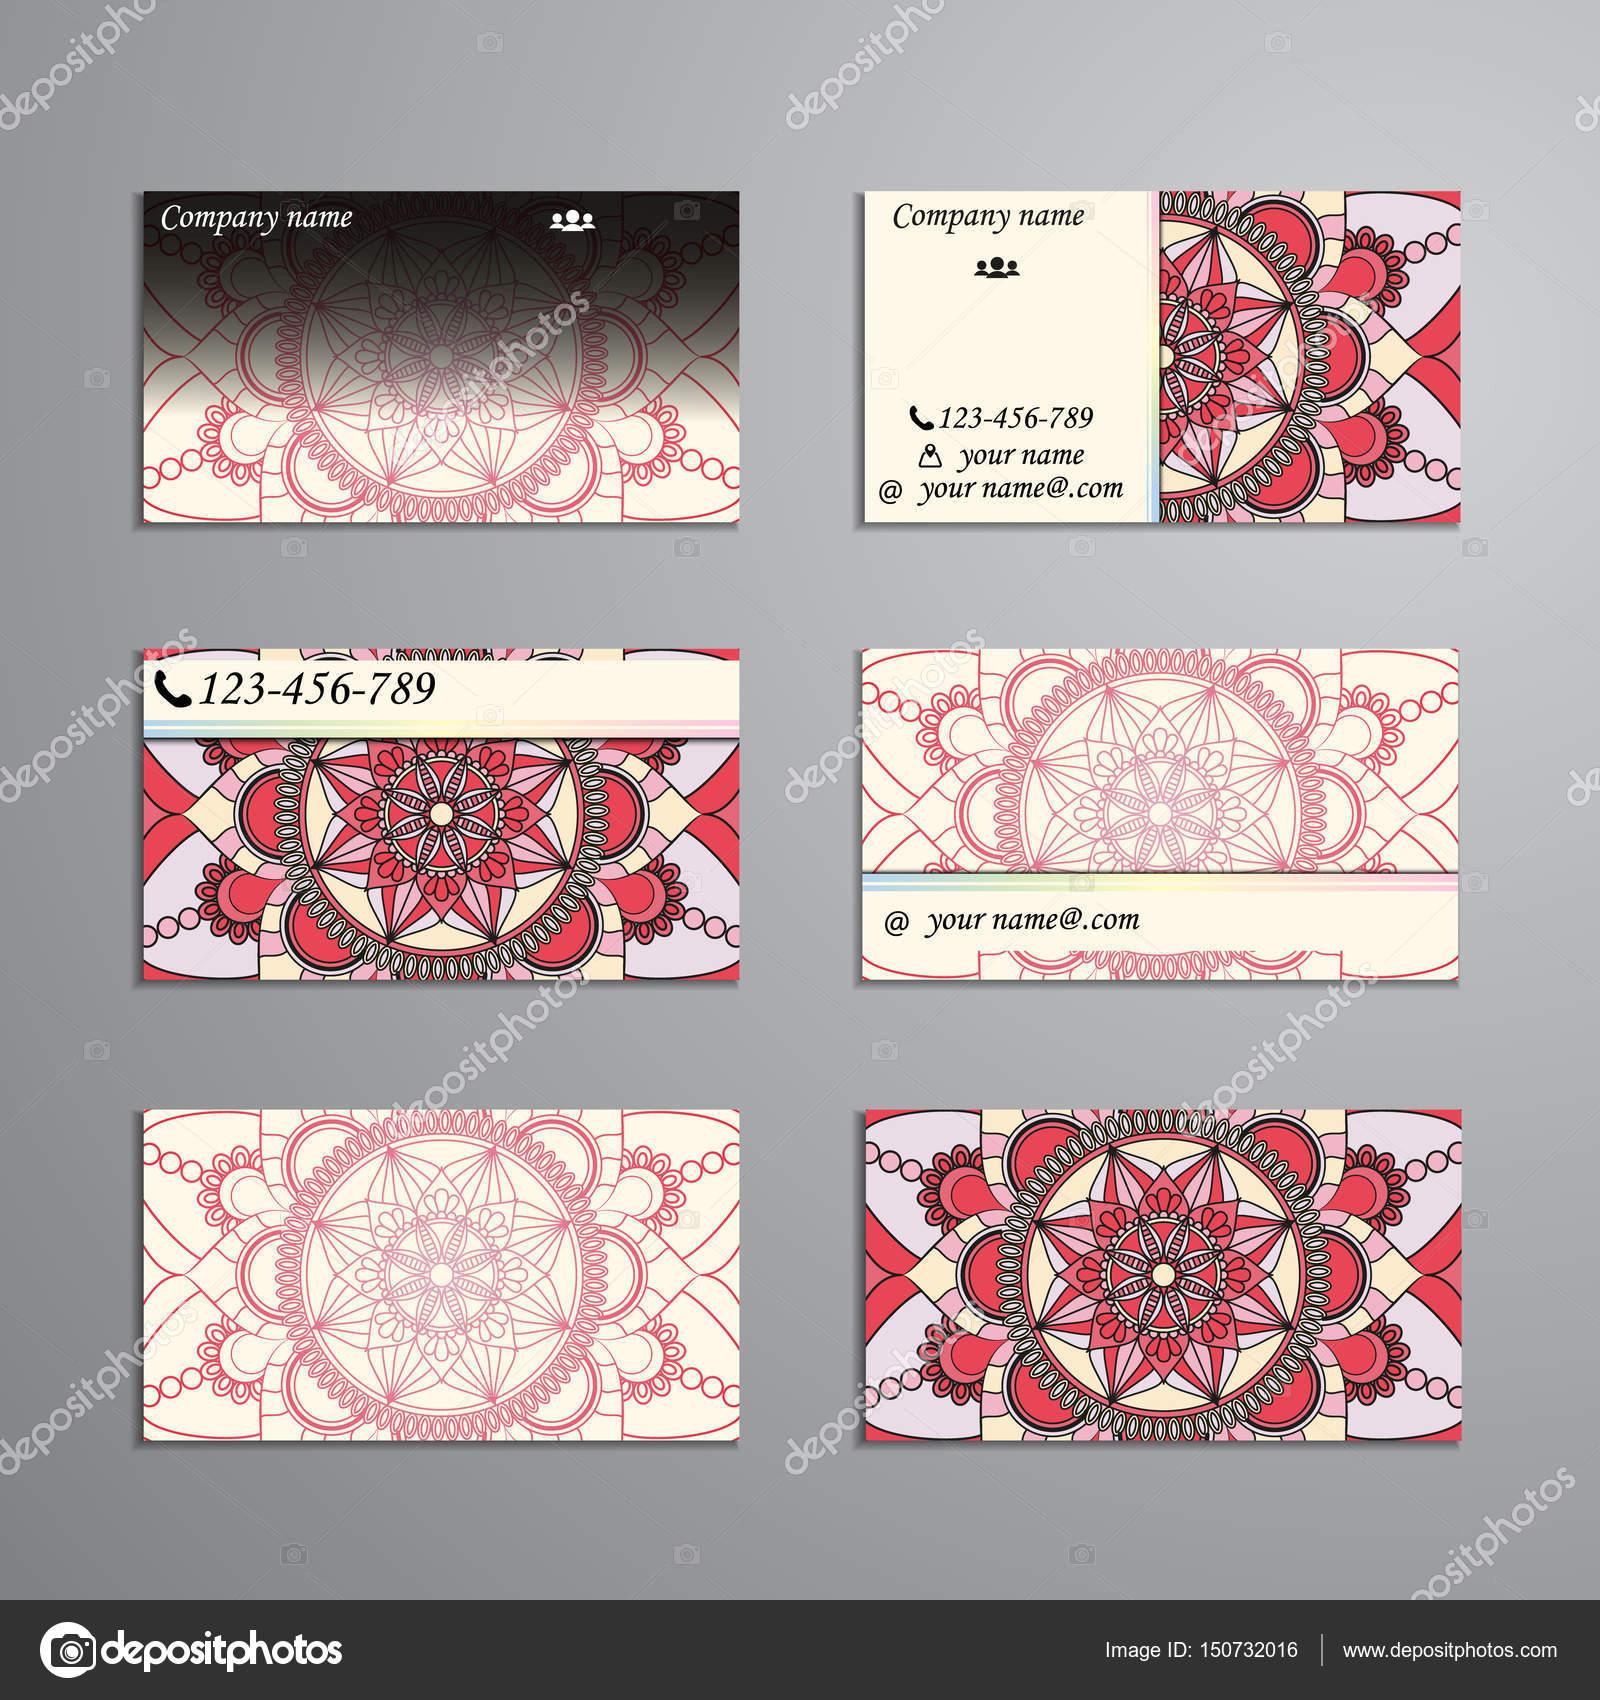 visitenkarte und visitenkarten groen satz blumen mandala muster stockvektor - Muster Visitenkarten